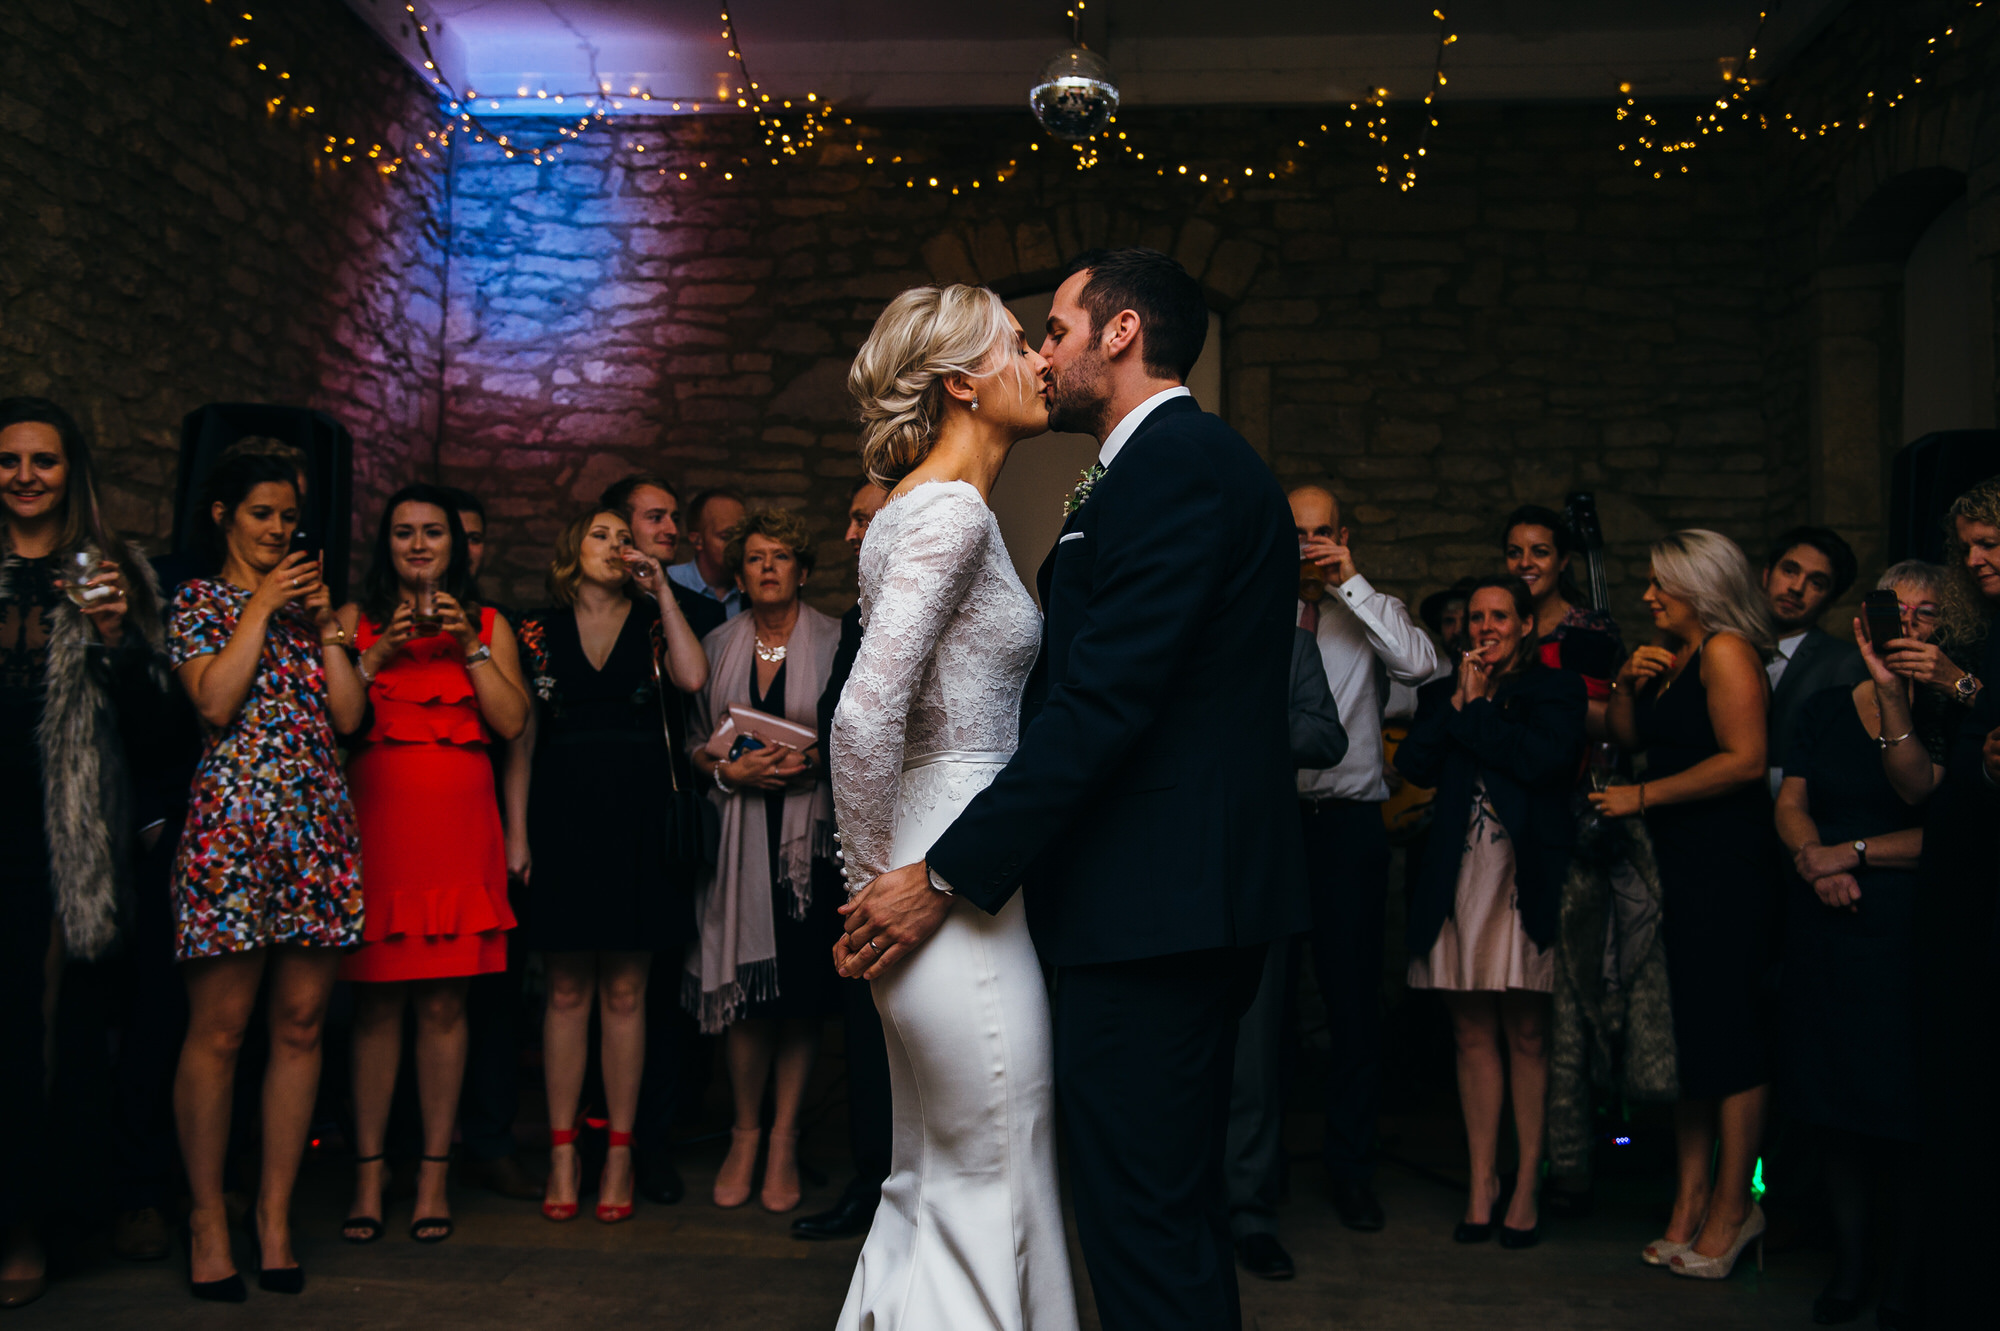 Brympton wedding first dance by simon biffen photography 44